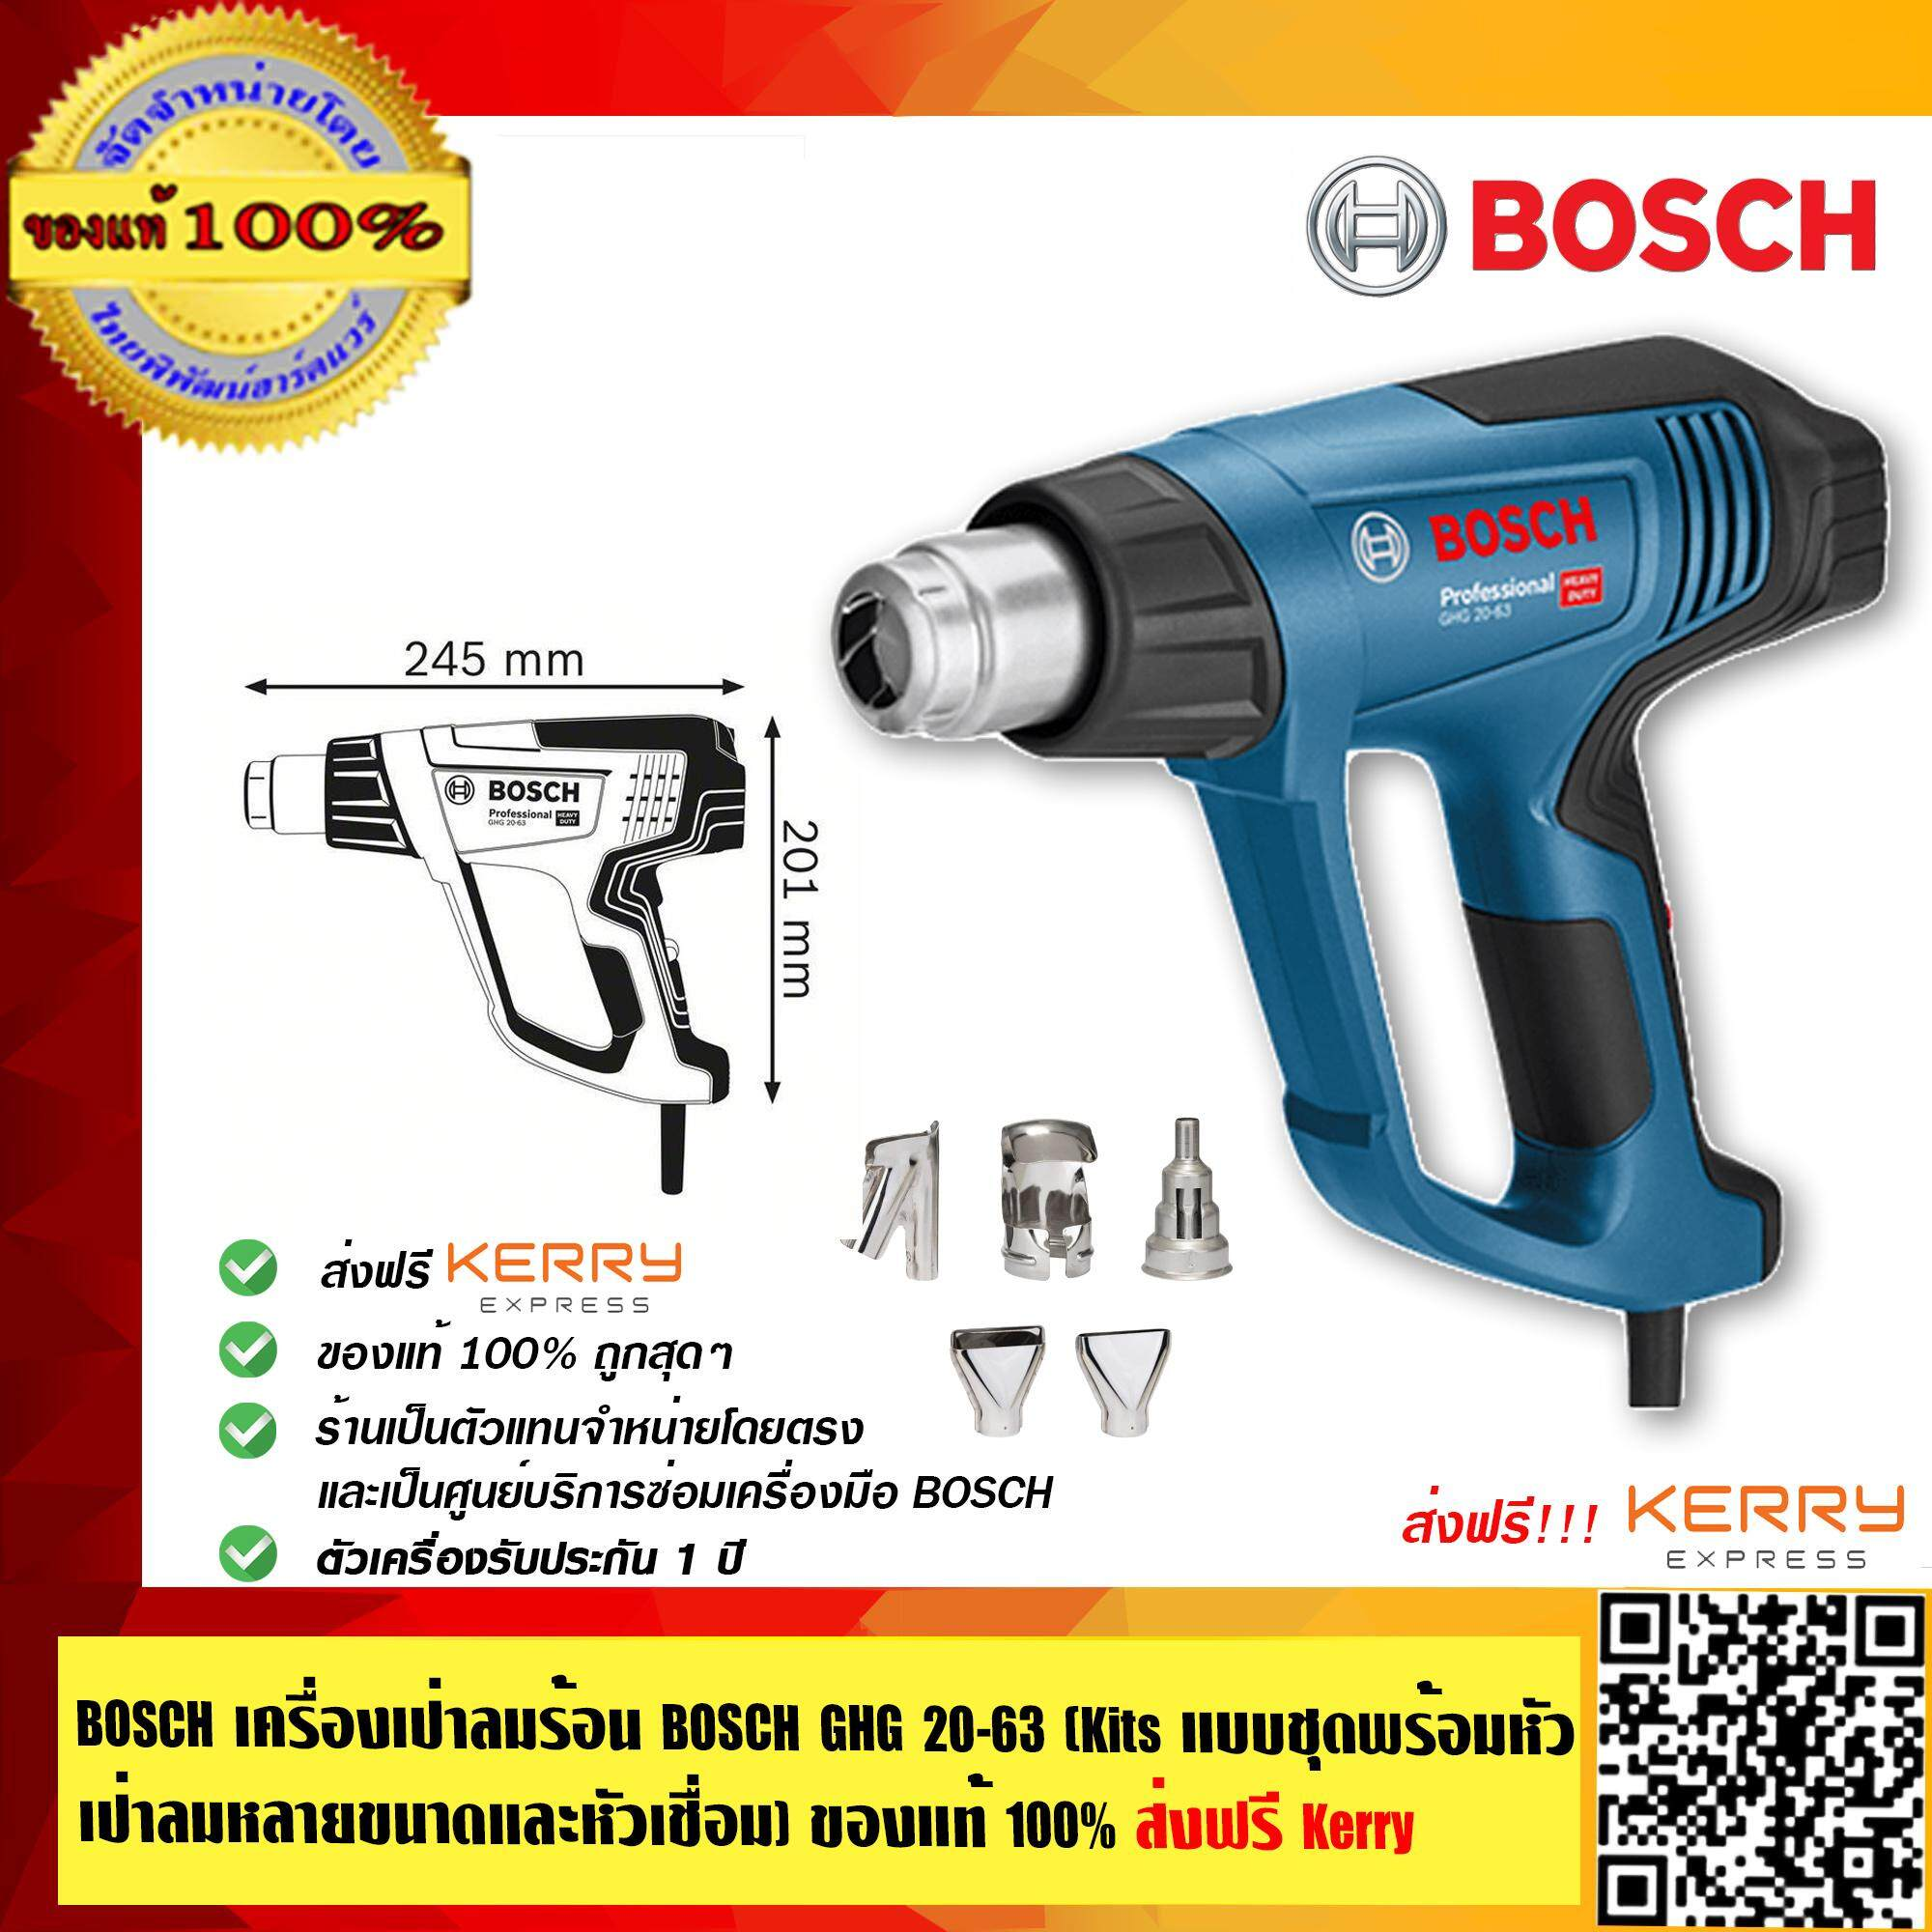 Bosch เครื่องเป่าลมร้อน Bosch Ghg 20-63 (kits แบบชุดพร้อมหัวเป่าลมหลายขนาดและหัวเชื่อม) ของแท้ 100% ส่งฟรี Kerry.